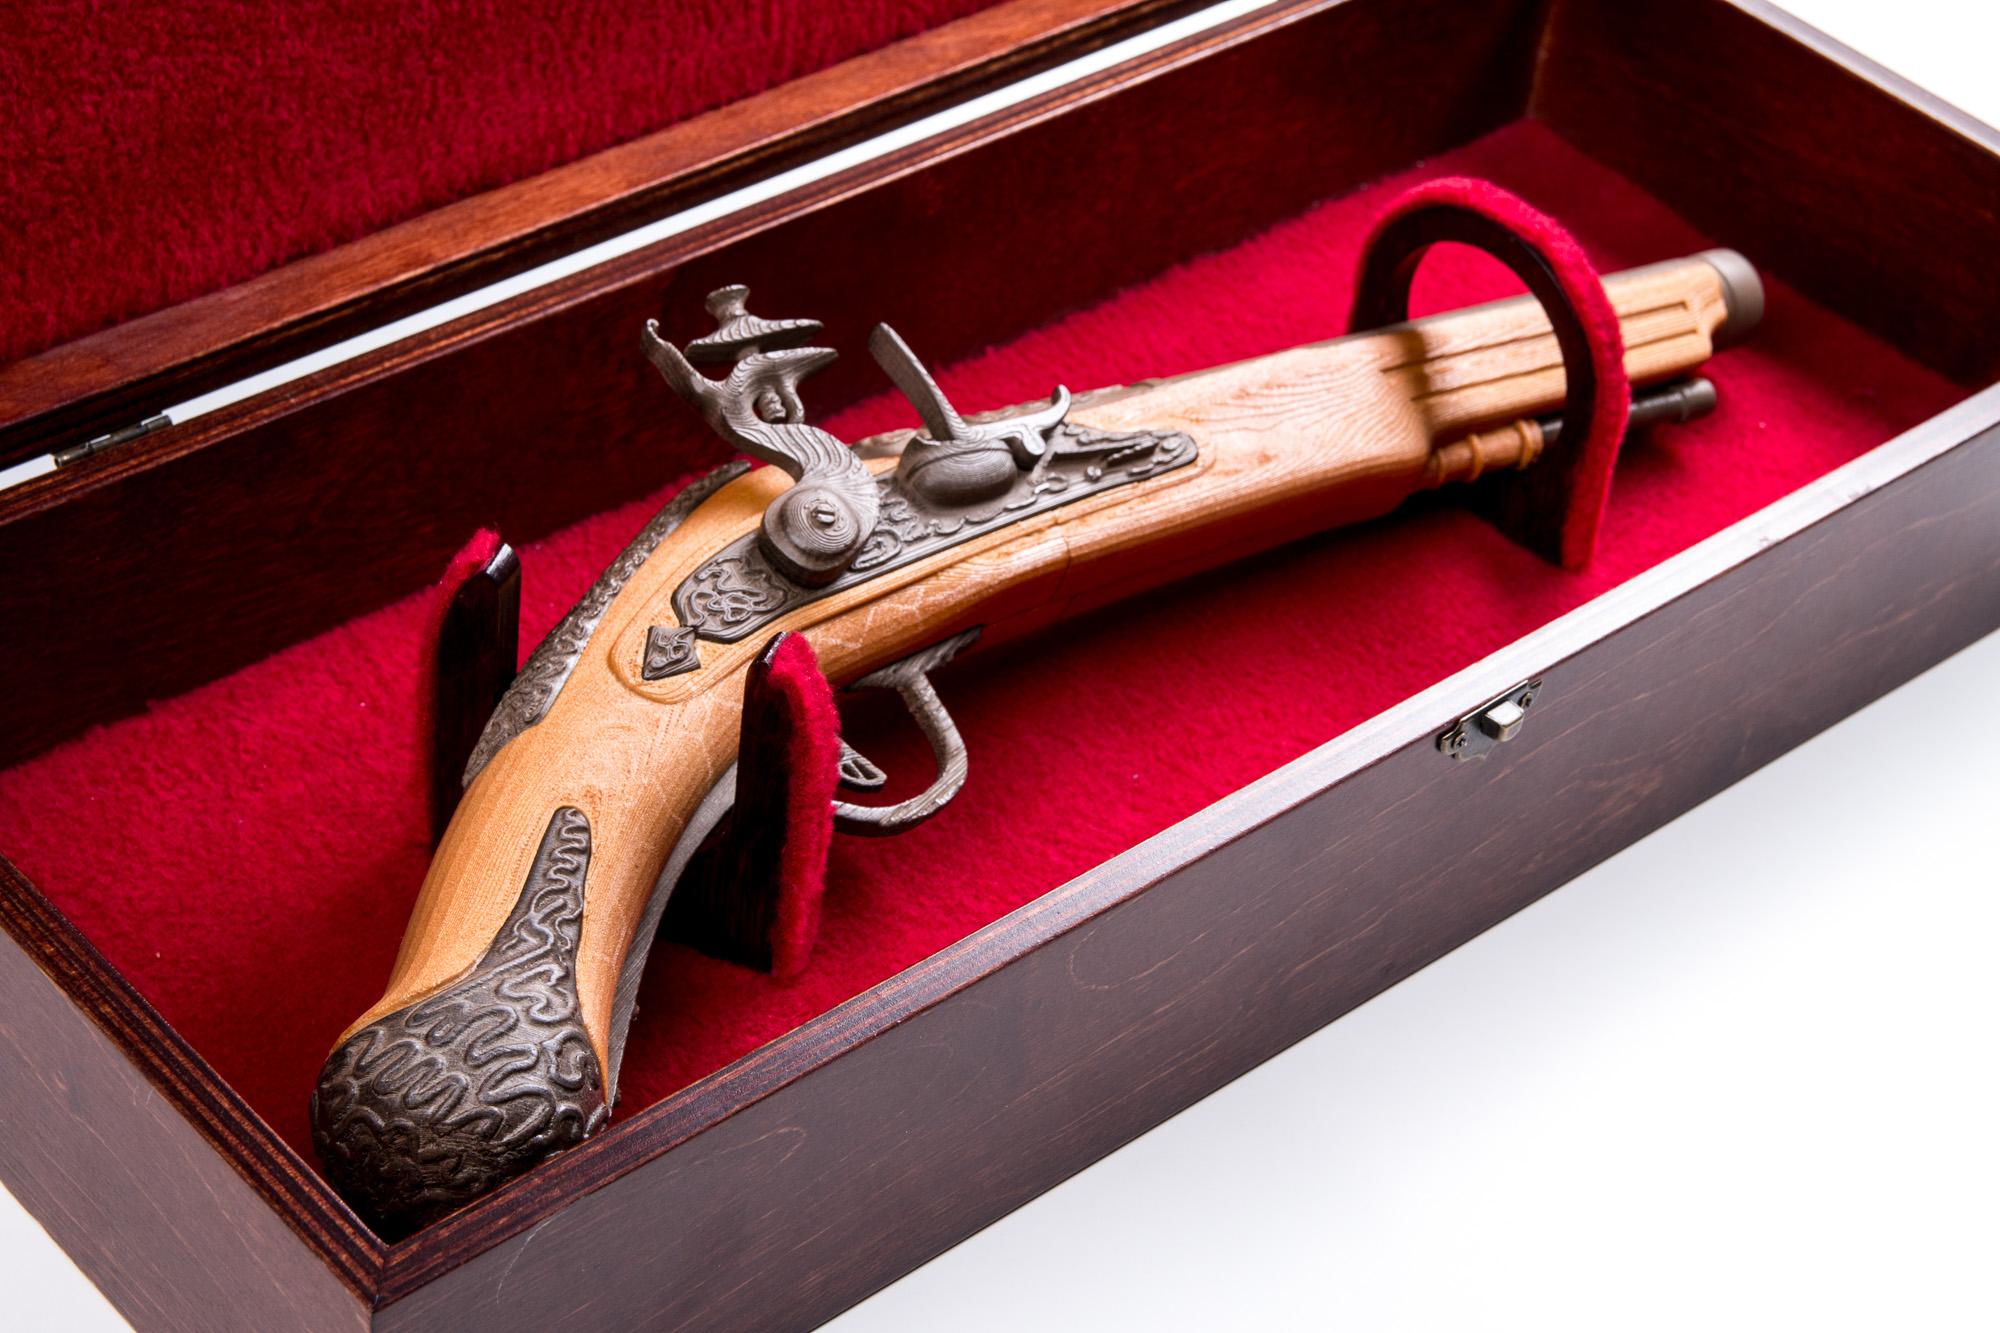 pistol_006